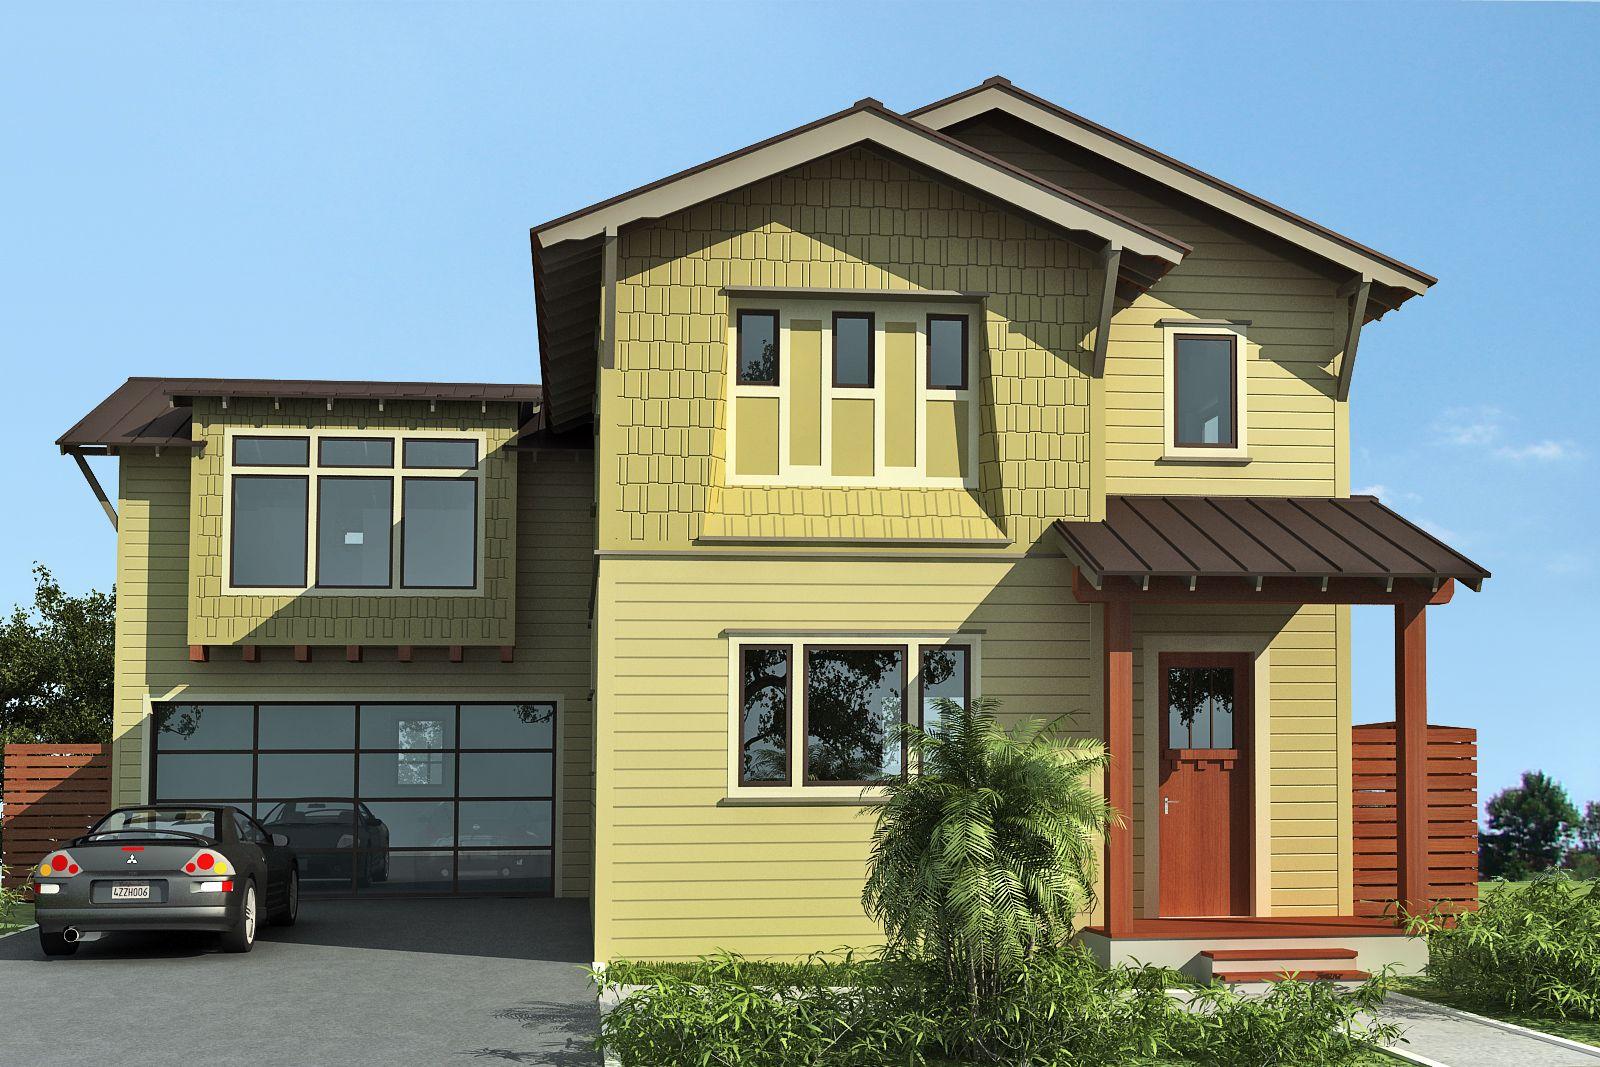 Admirable 17 Best Images About House Color Ideas On Pinterest Paint Colors Largest Home Design Picture Inspirations Pitcheantrous